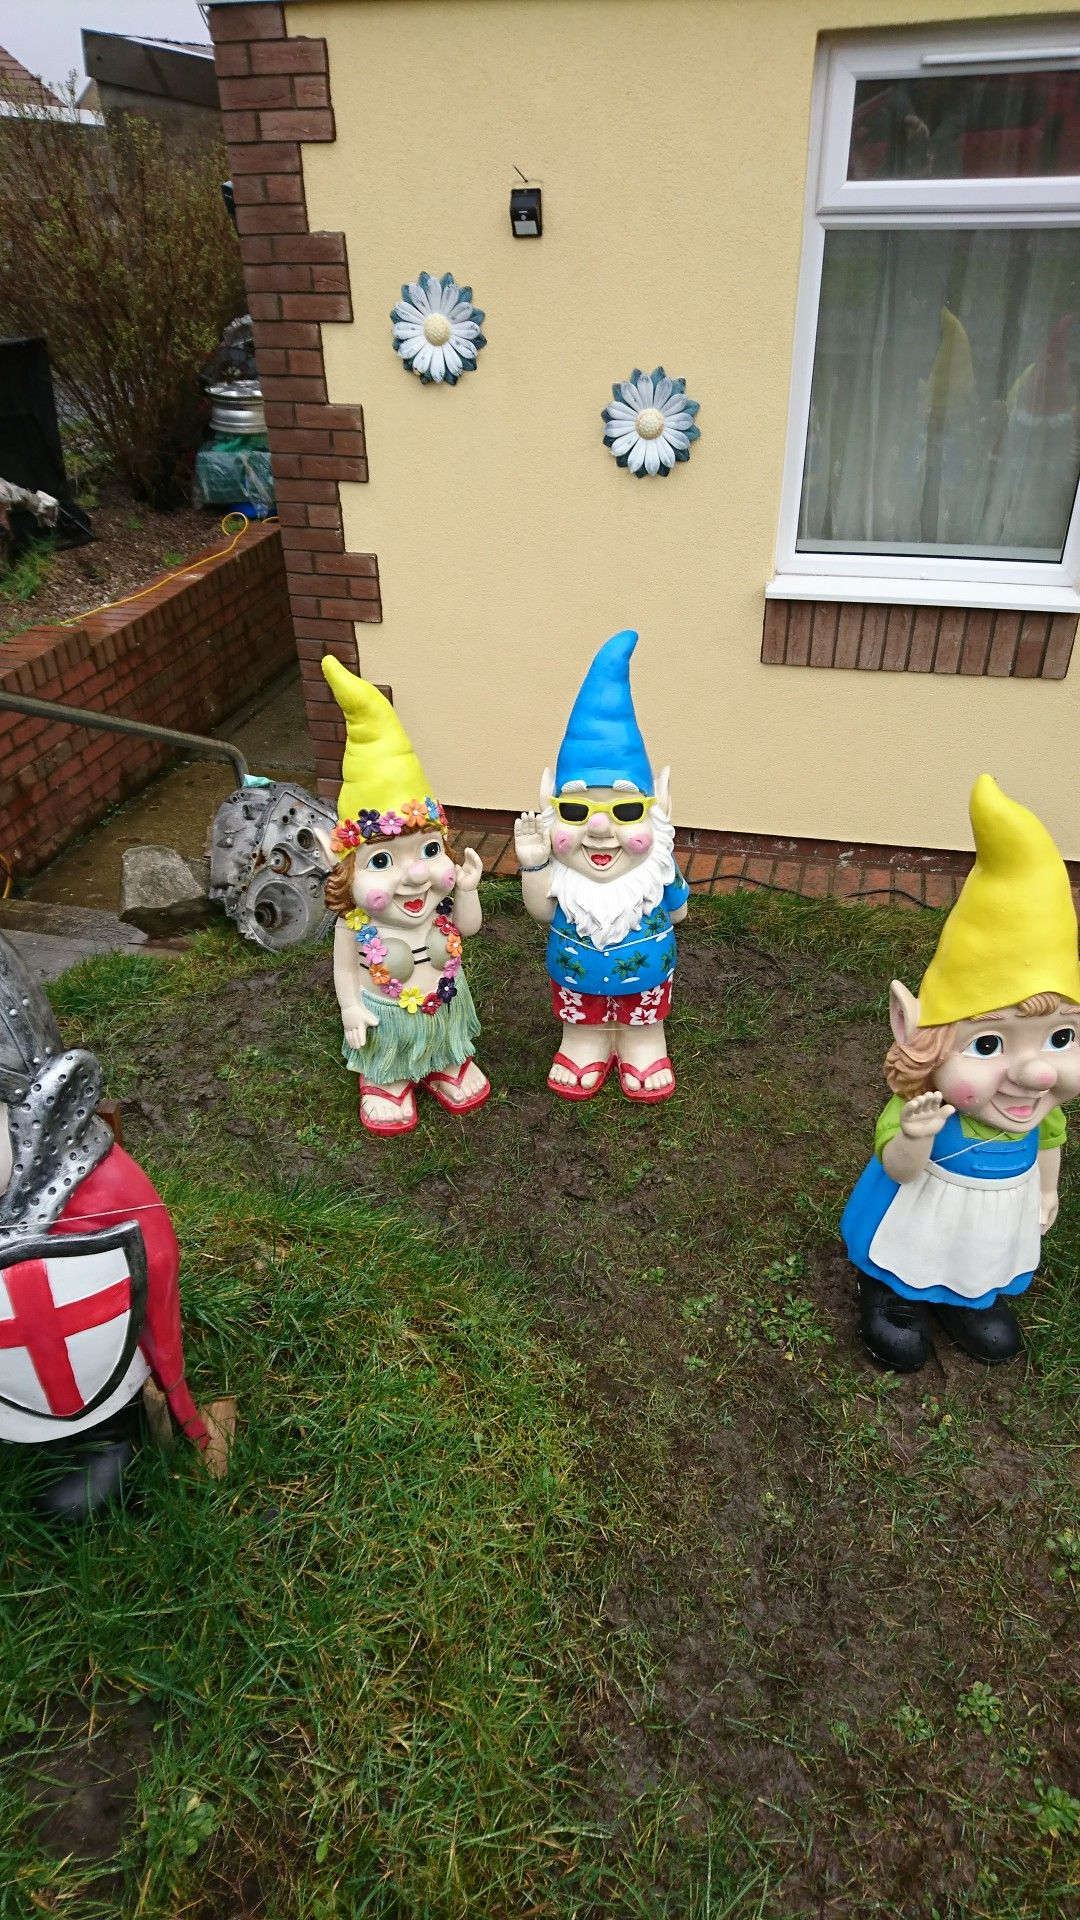 Pin by Tiffany Pineda on Gnomes | Pinterest | Gnomes